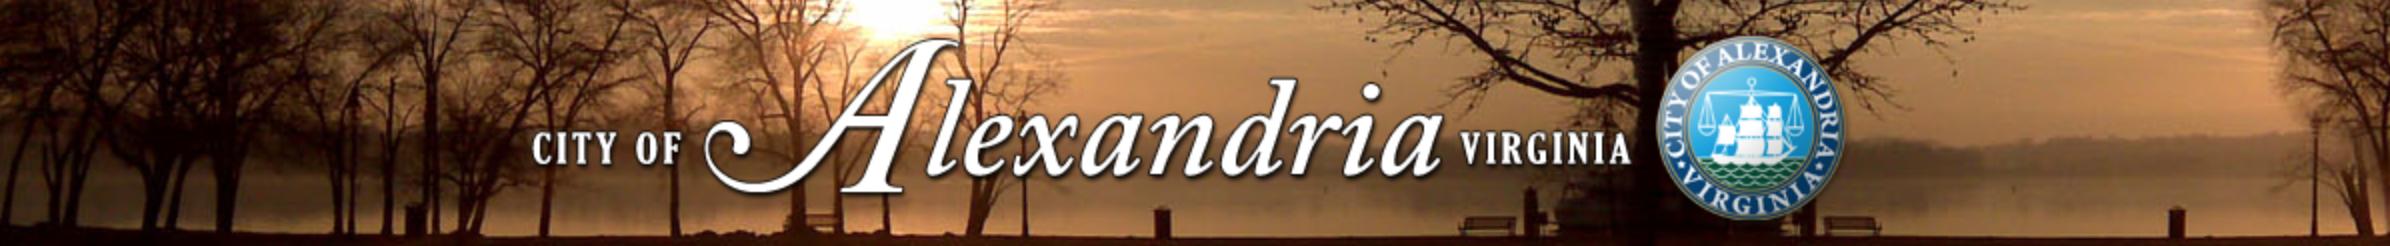 http://www.alexandriava.gov